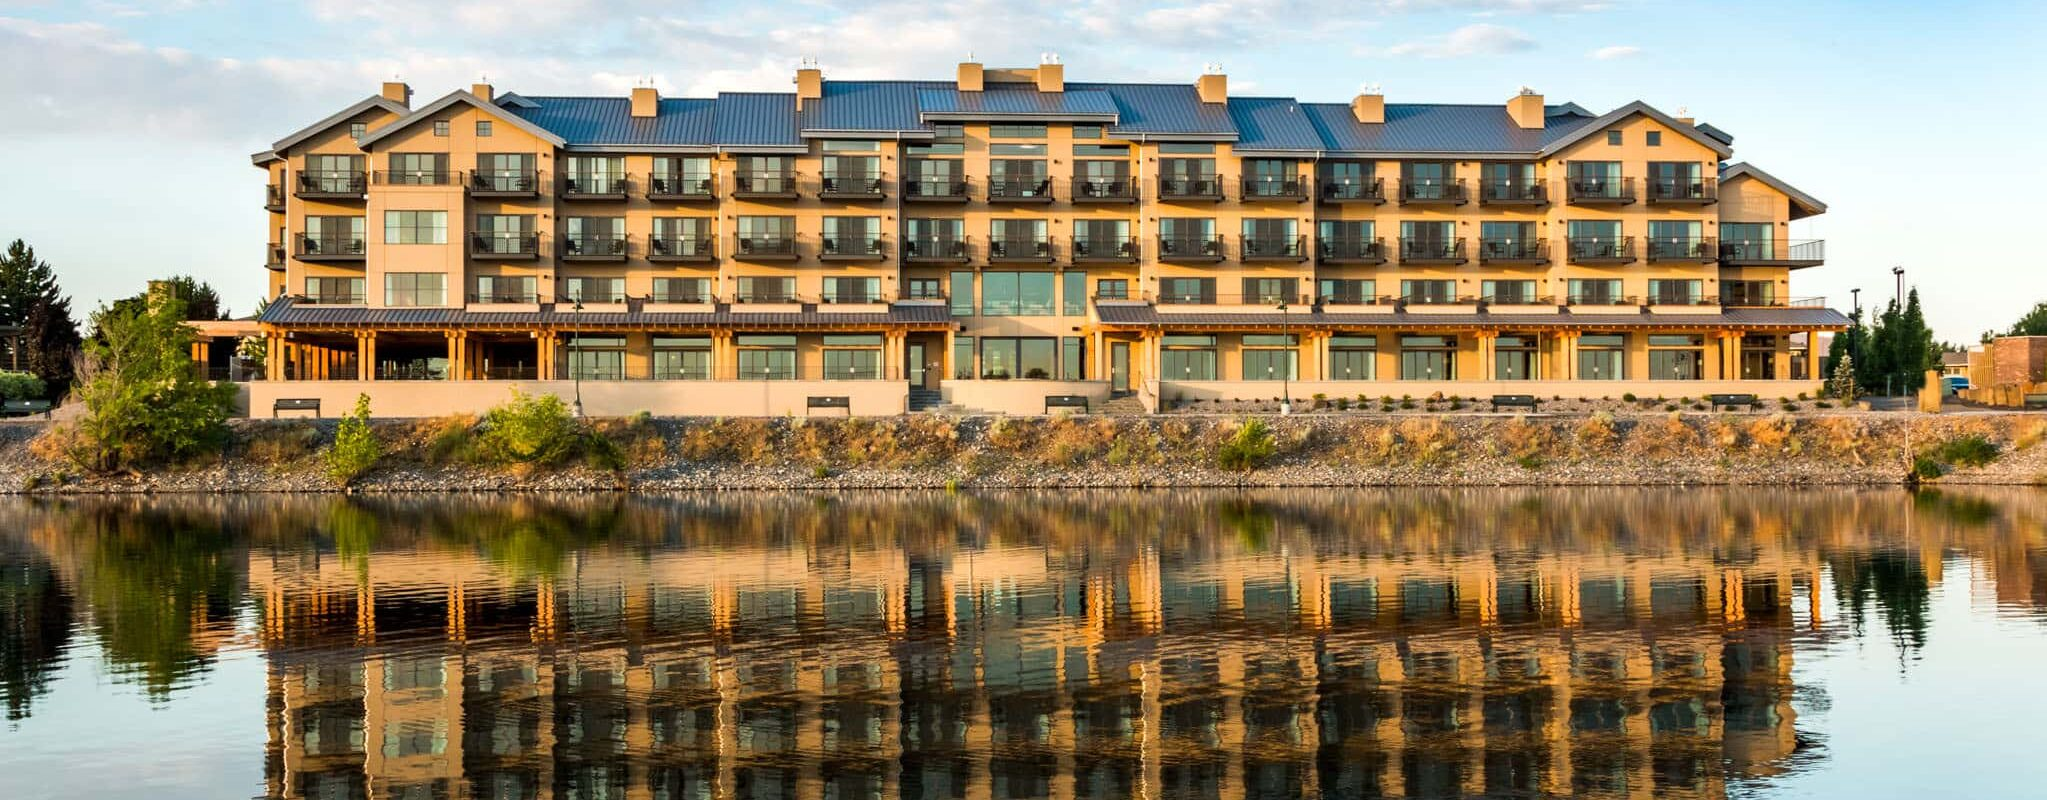 Riverfront Hotel in Richland, Washington